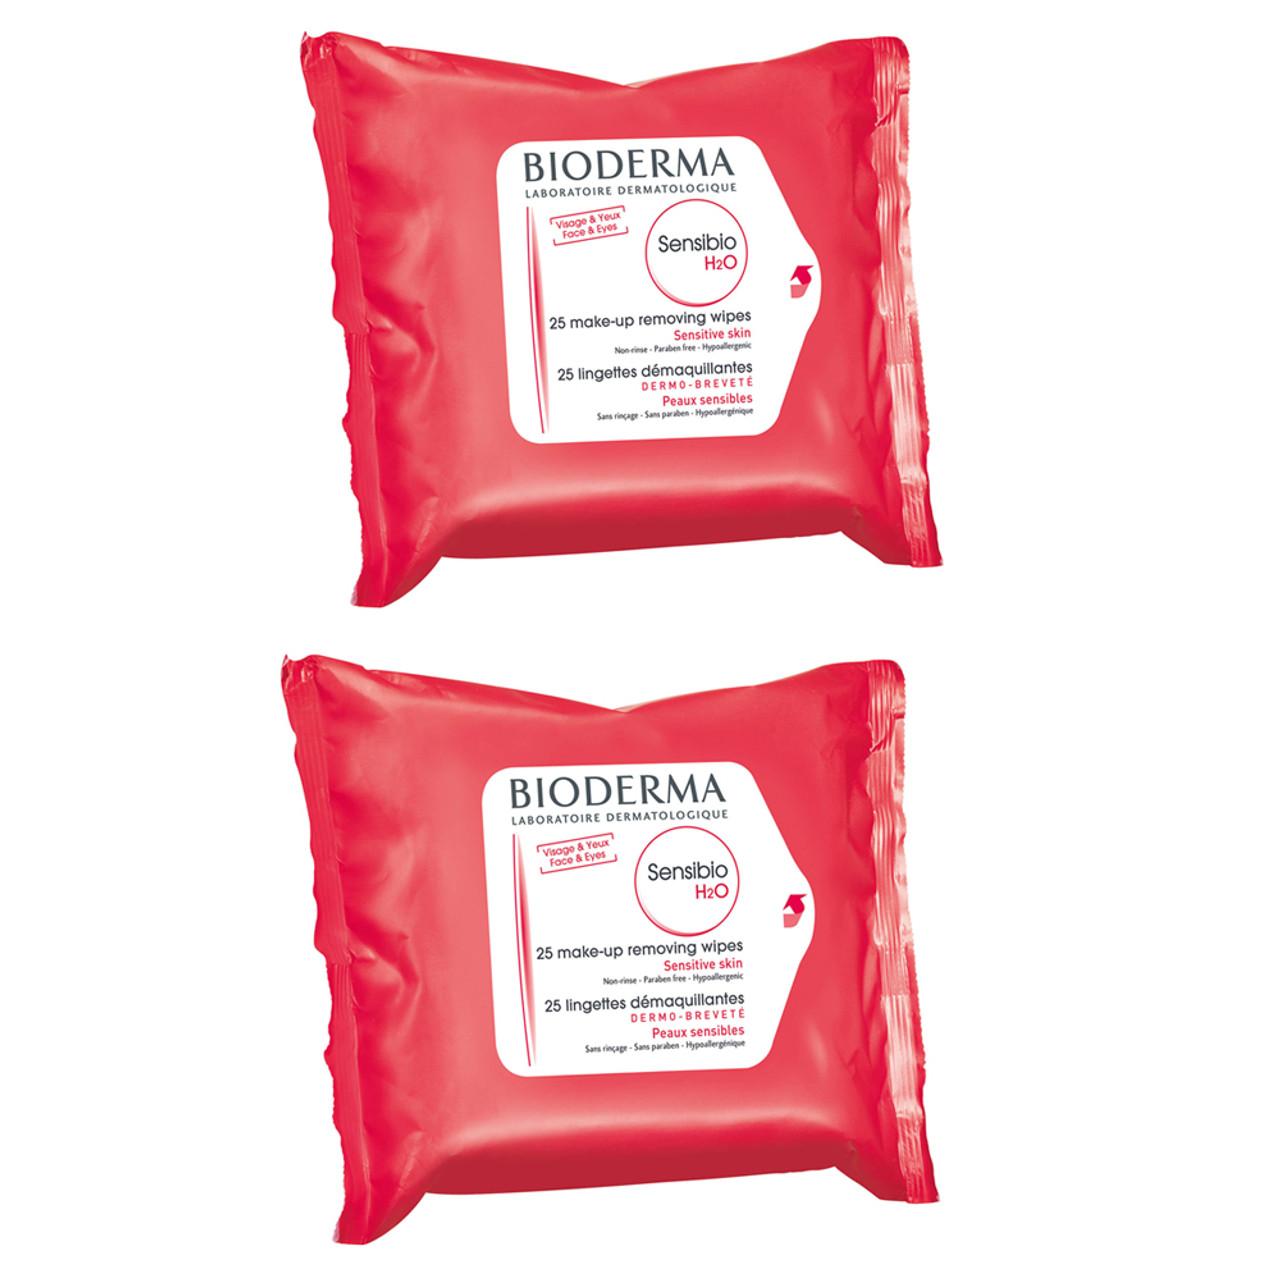 Bioderma Sensibio H2O Wipes Single